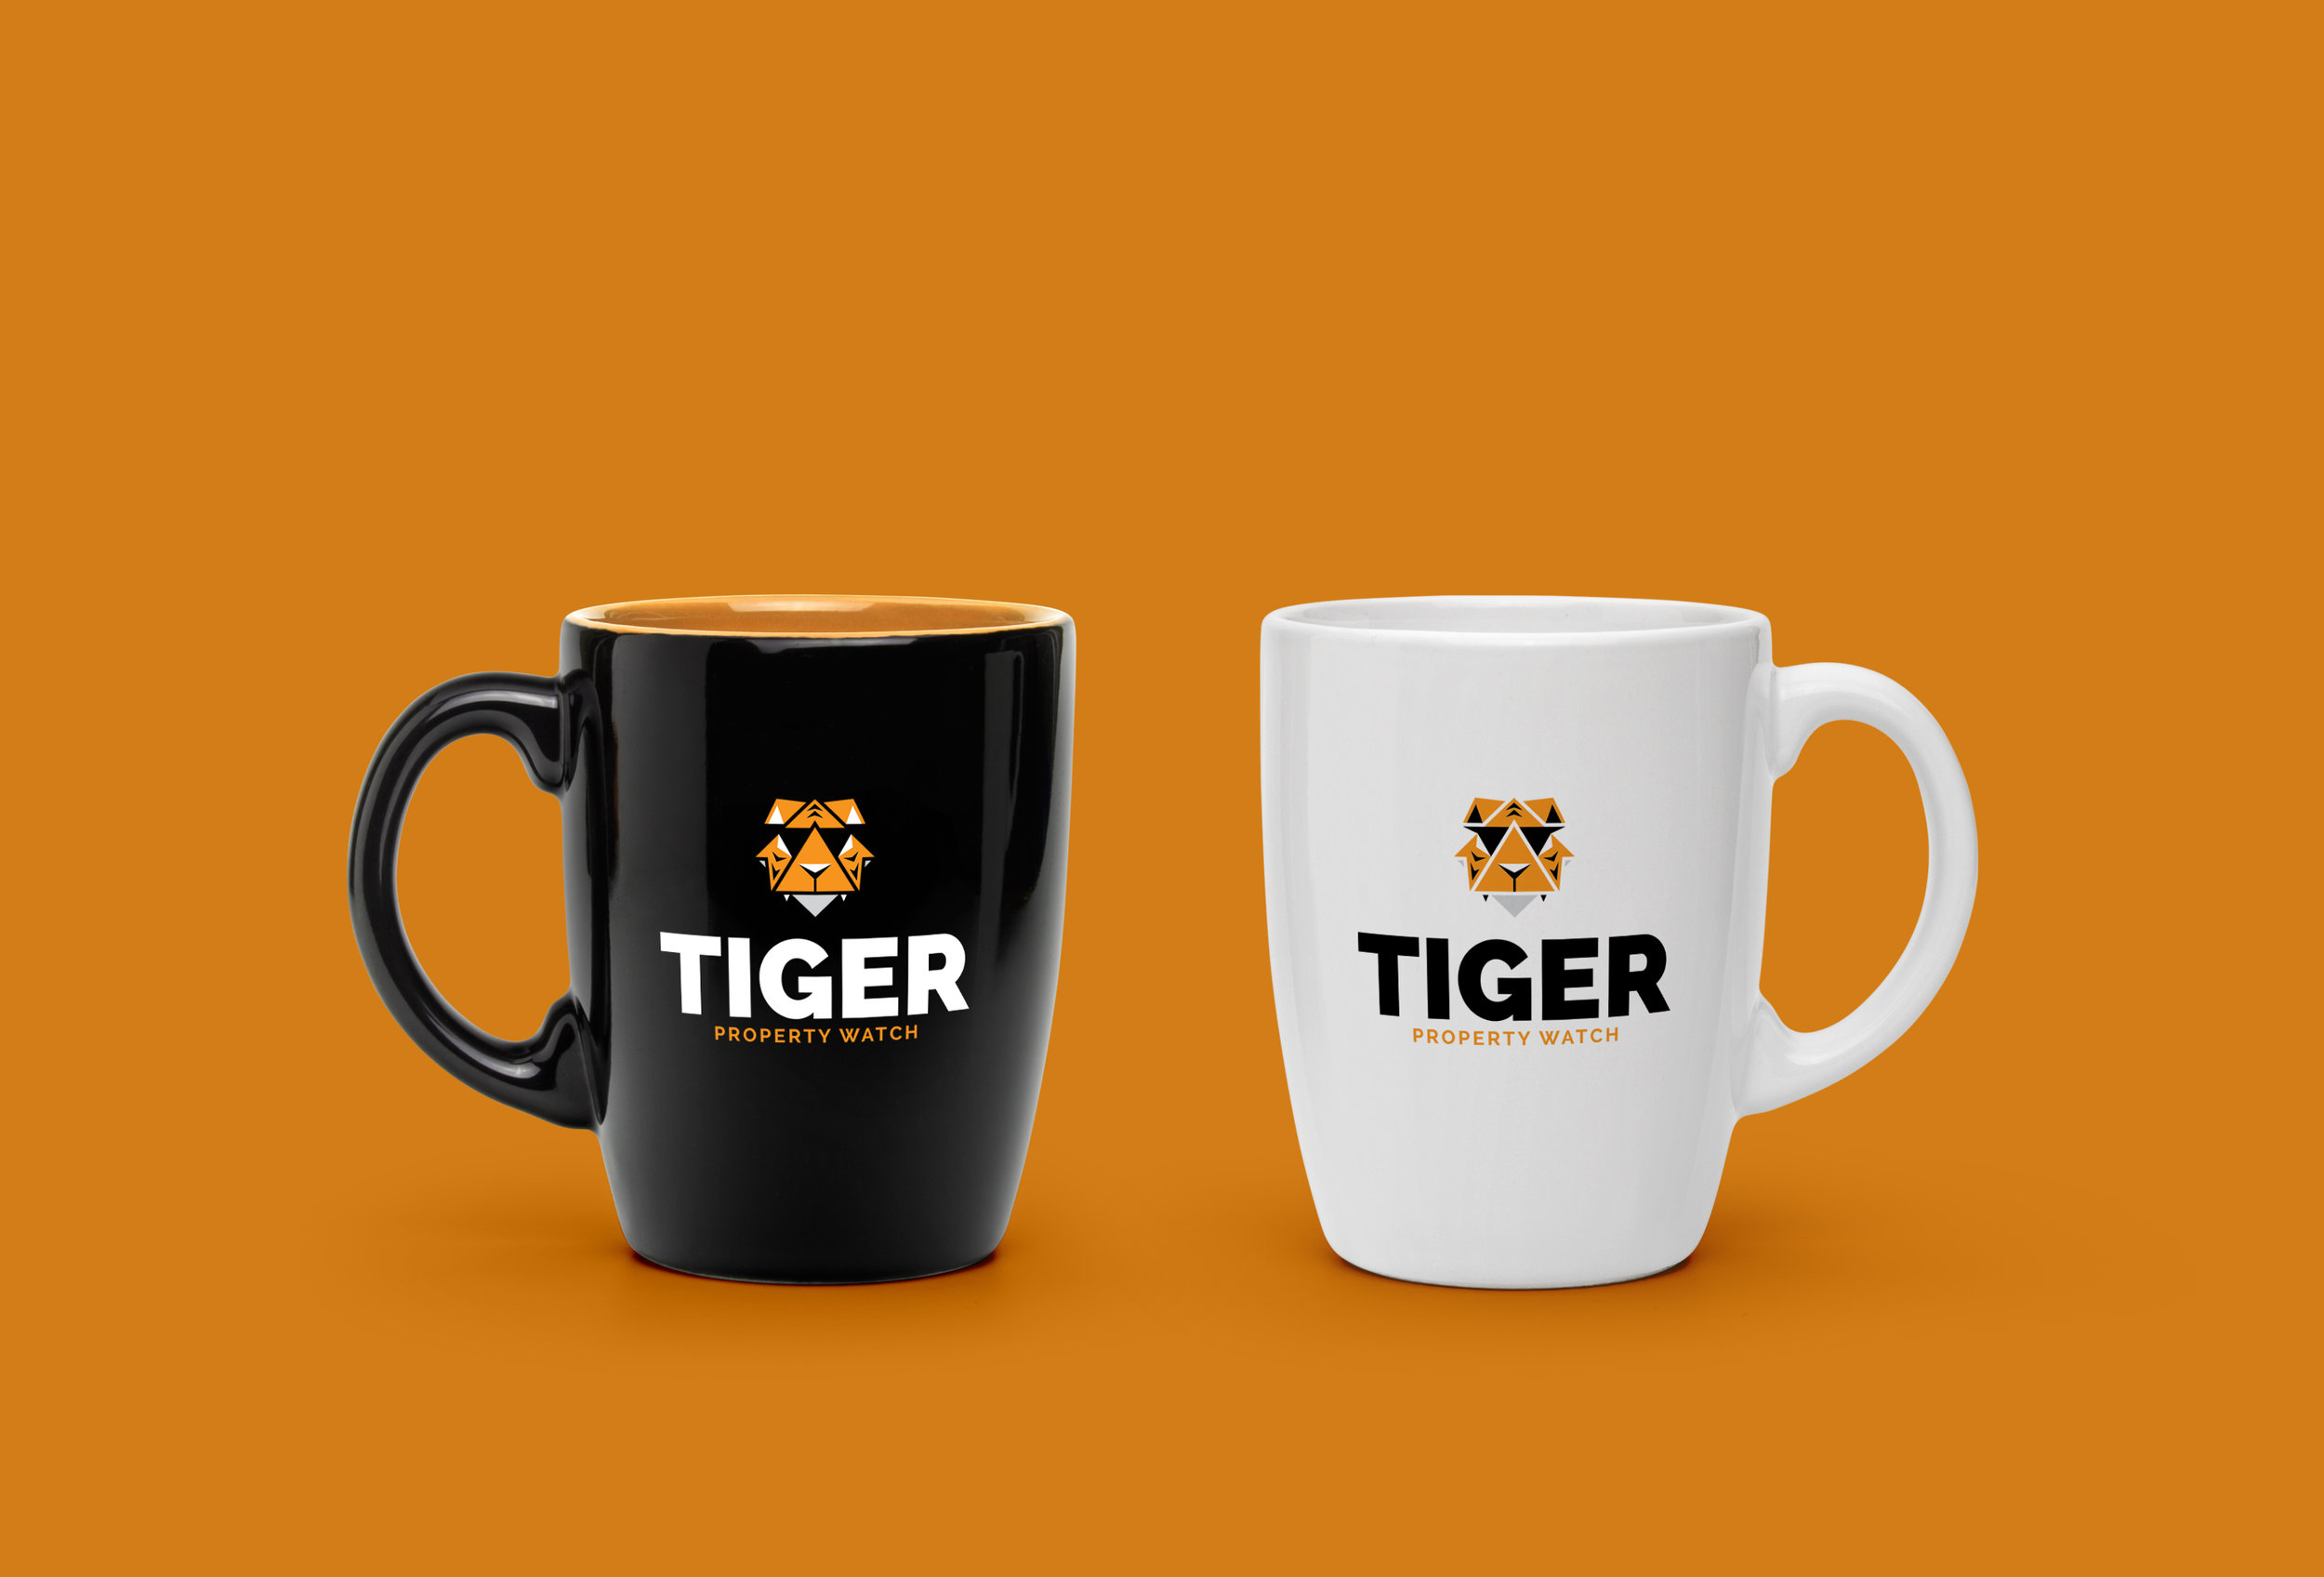 Mug MockUp_Tiger2.jpg